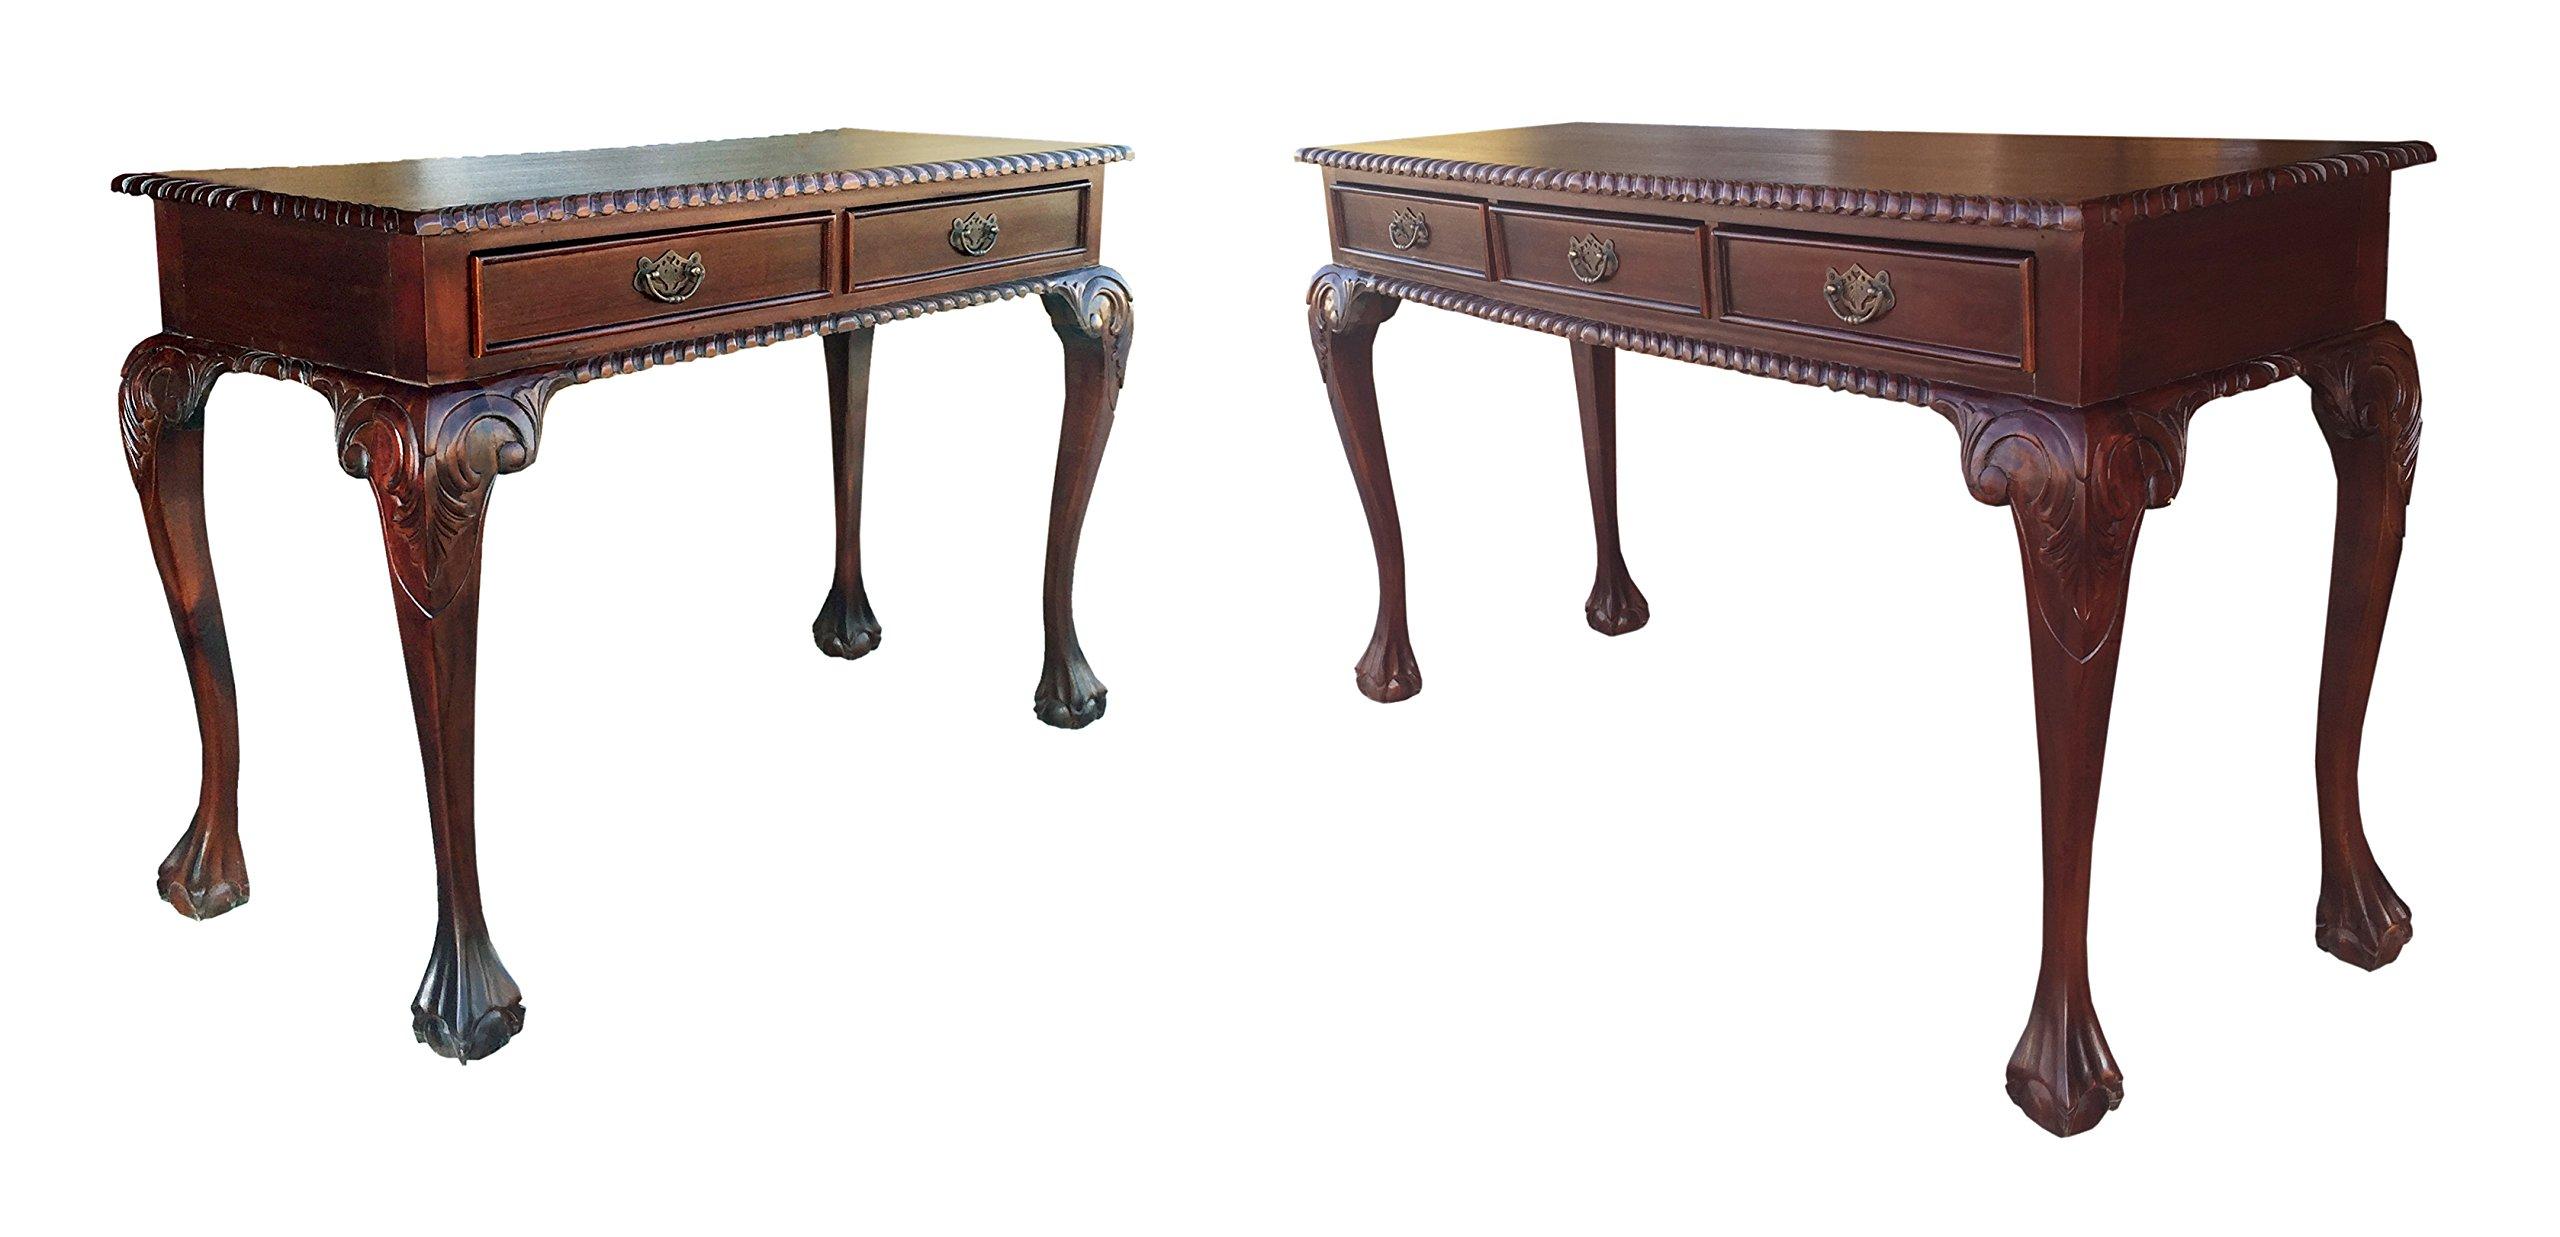 D-art England Writing Desk 2 drw and England Writing Desk 3 drw - In Mahogany Wood